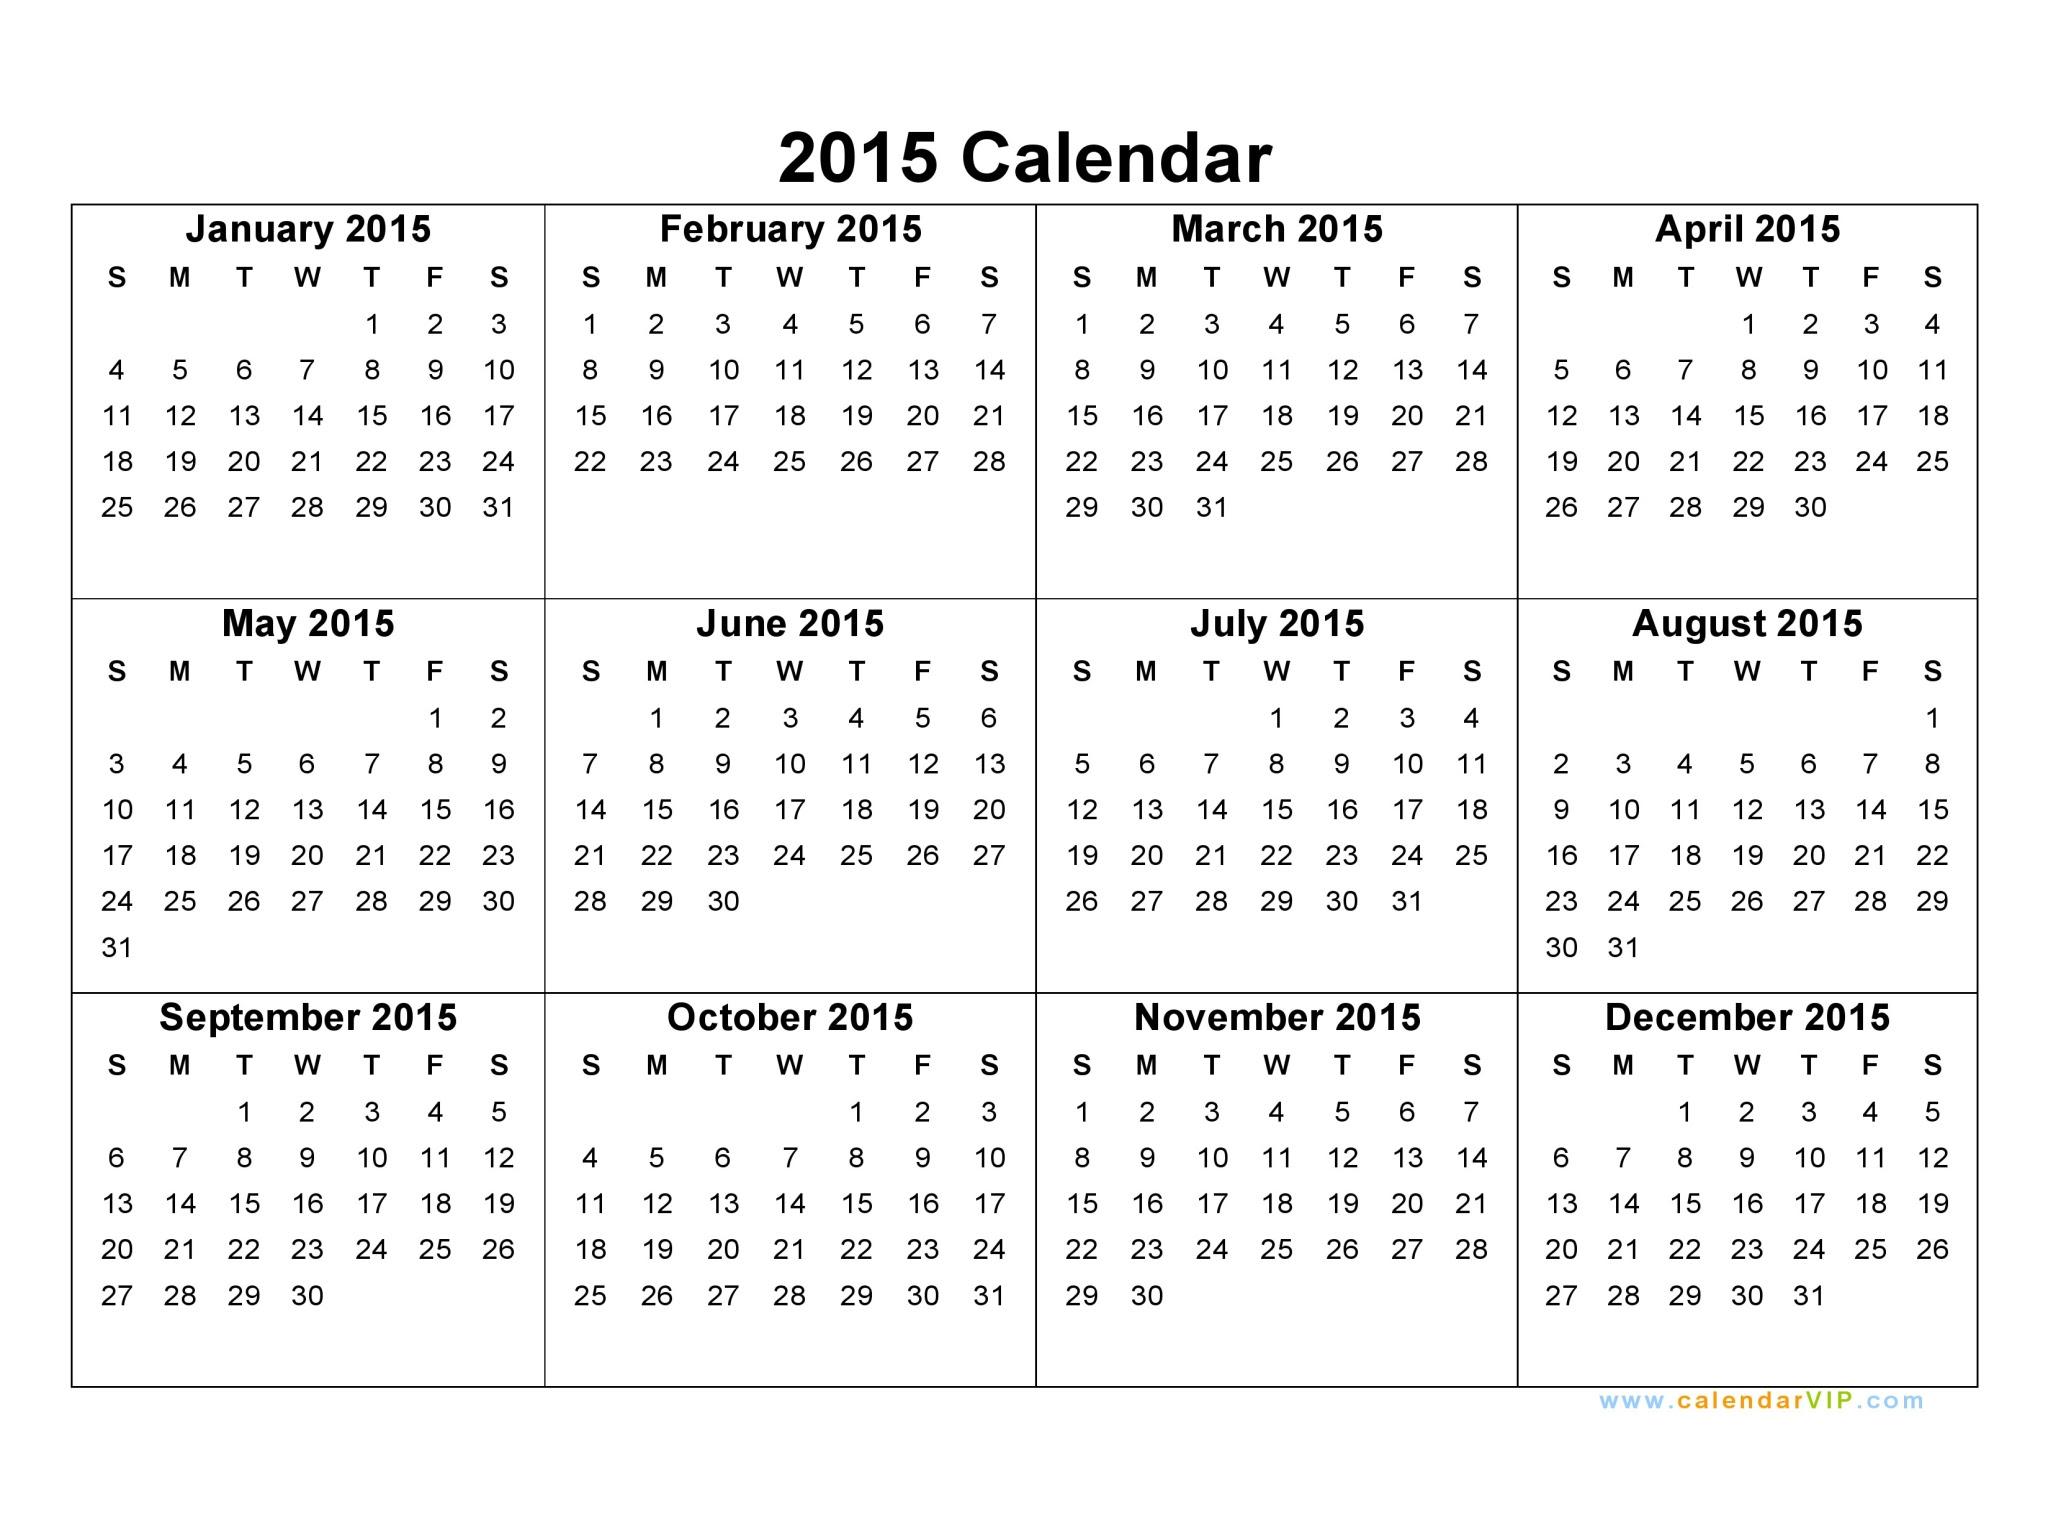 CALENDAR 2015 - Tasarman Web